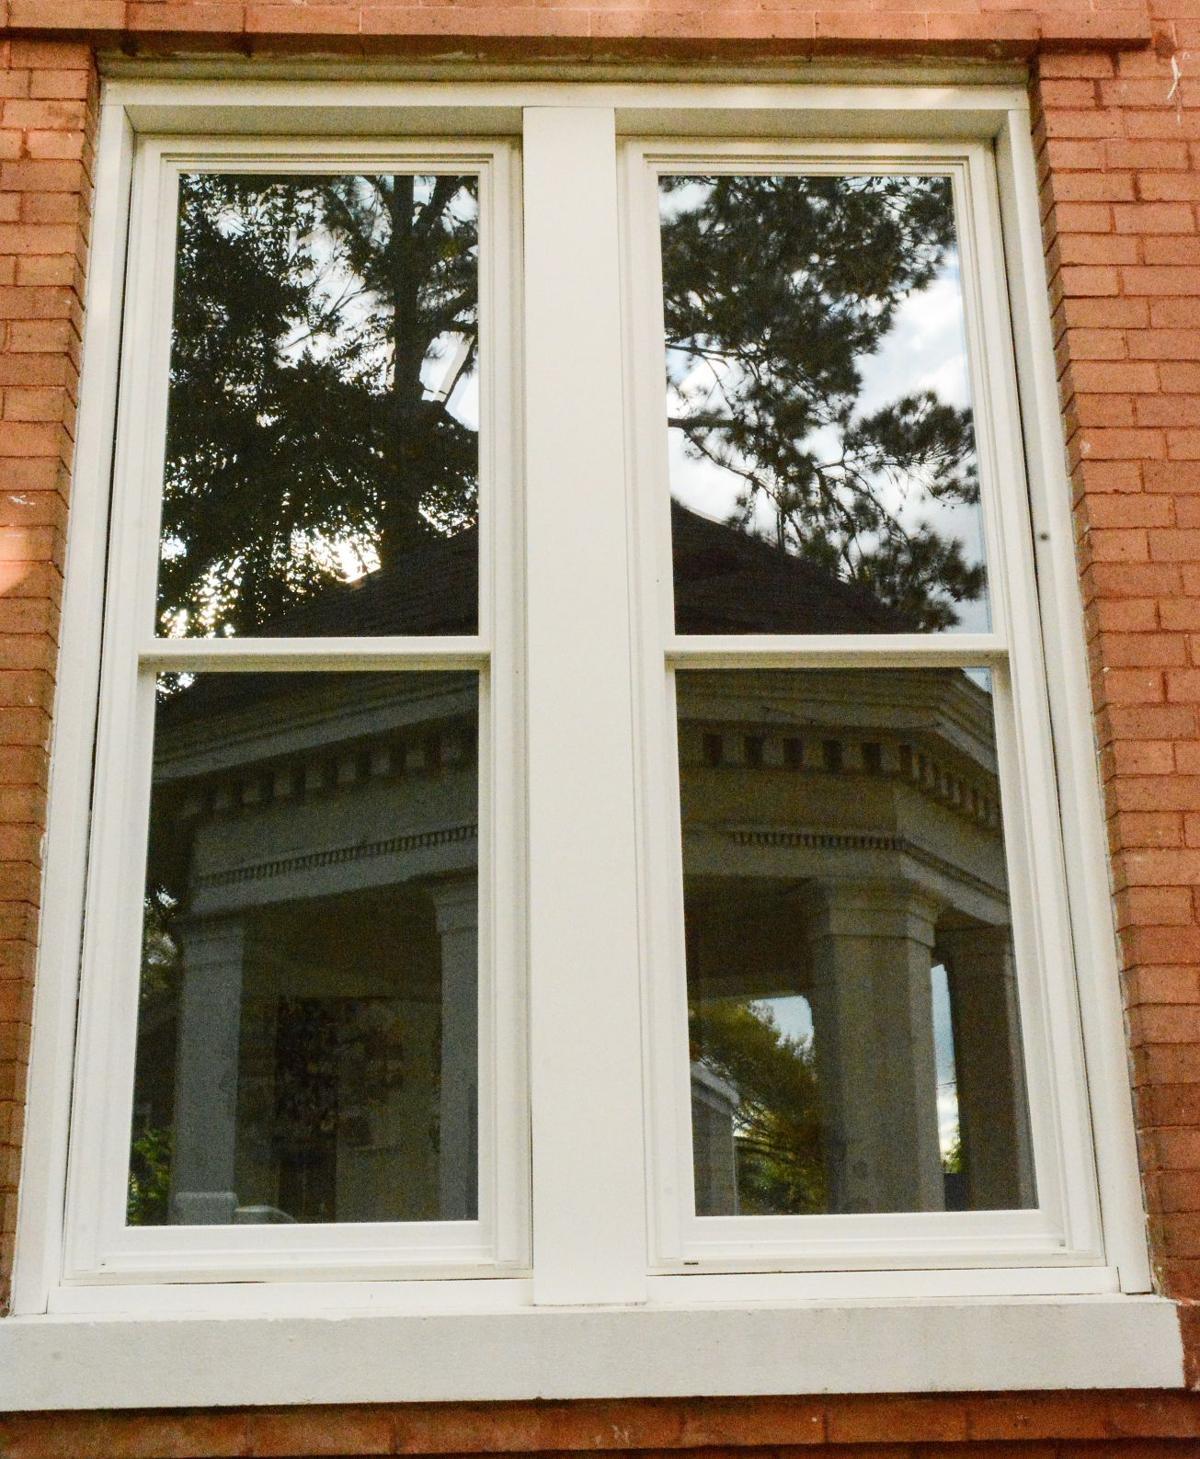 West_Feliciana_Courthouse_windows002